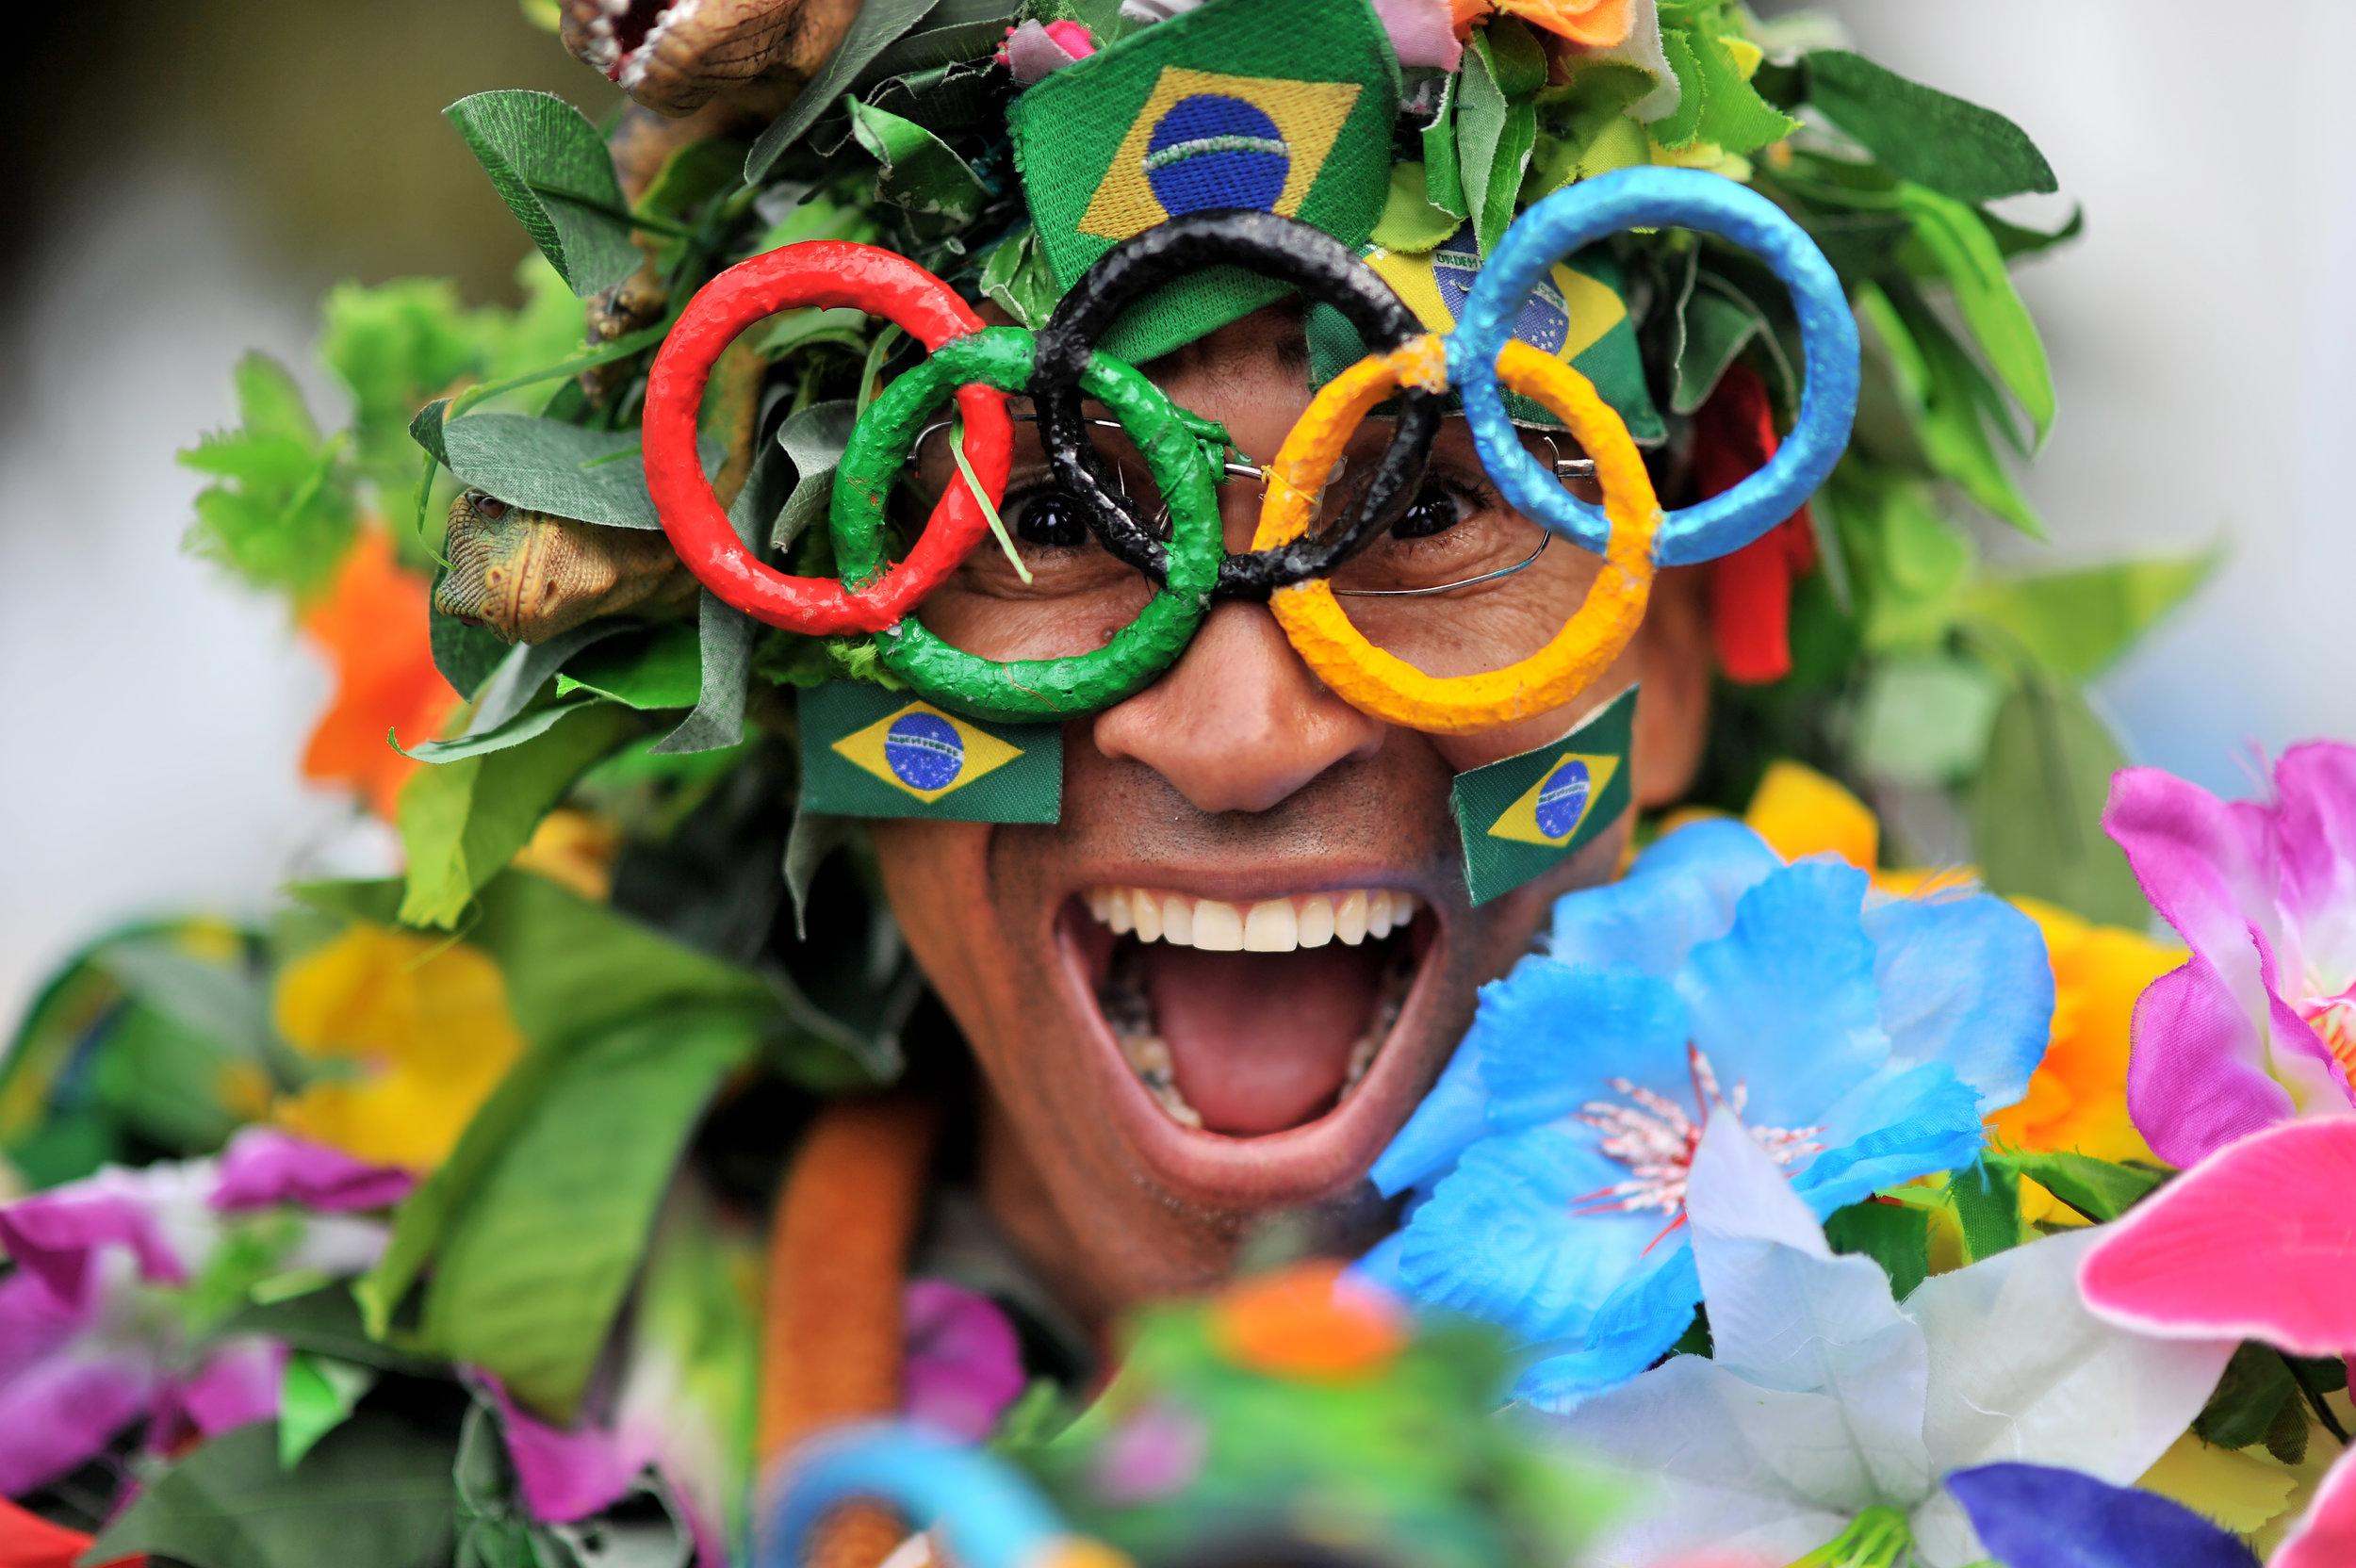 José Geraldo Da Silva celebrates his Olympic spirit at Copacabana Beach in Rio de Janeiro, Brazil, on August 7, 2016. (Sarah Stier | Ball State at the Games)